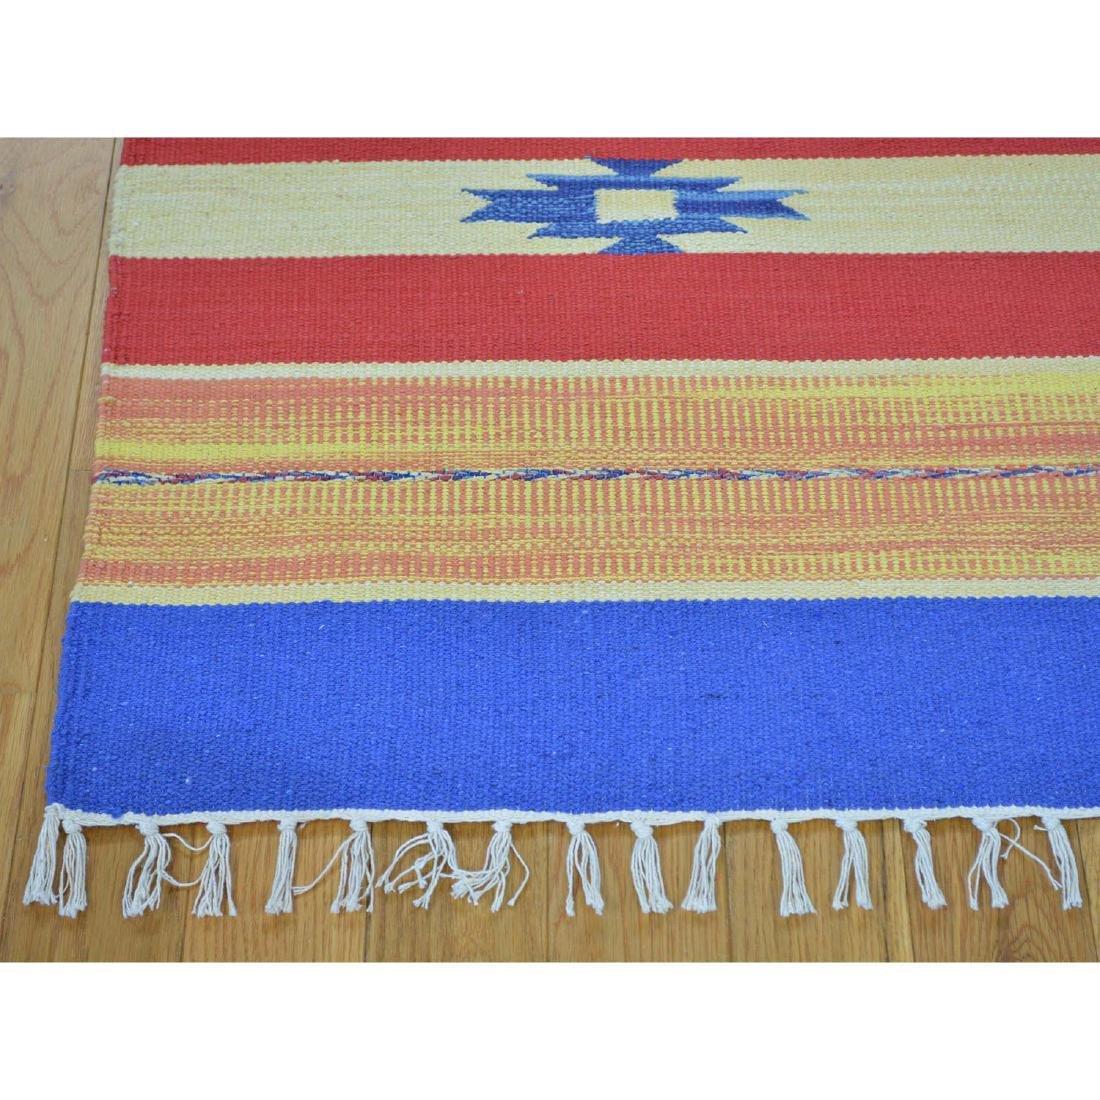 Flat Weave Kilim Hand Woven Navajo Design Rug 6x6.1 - 3